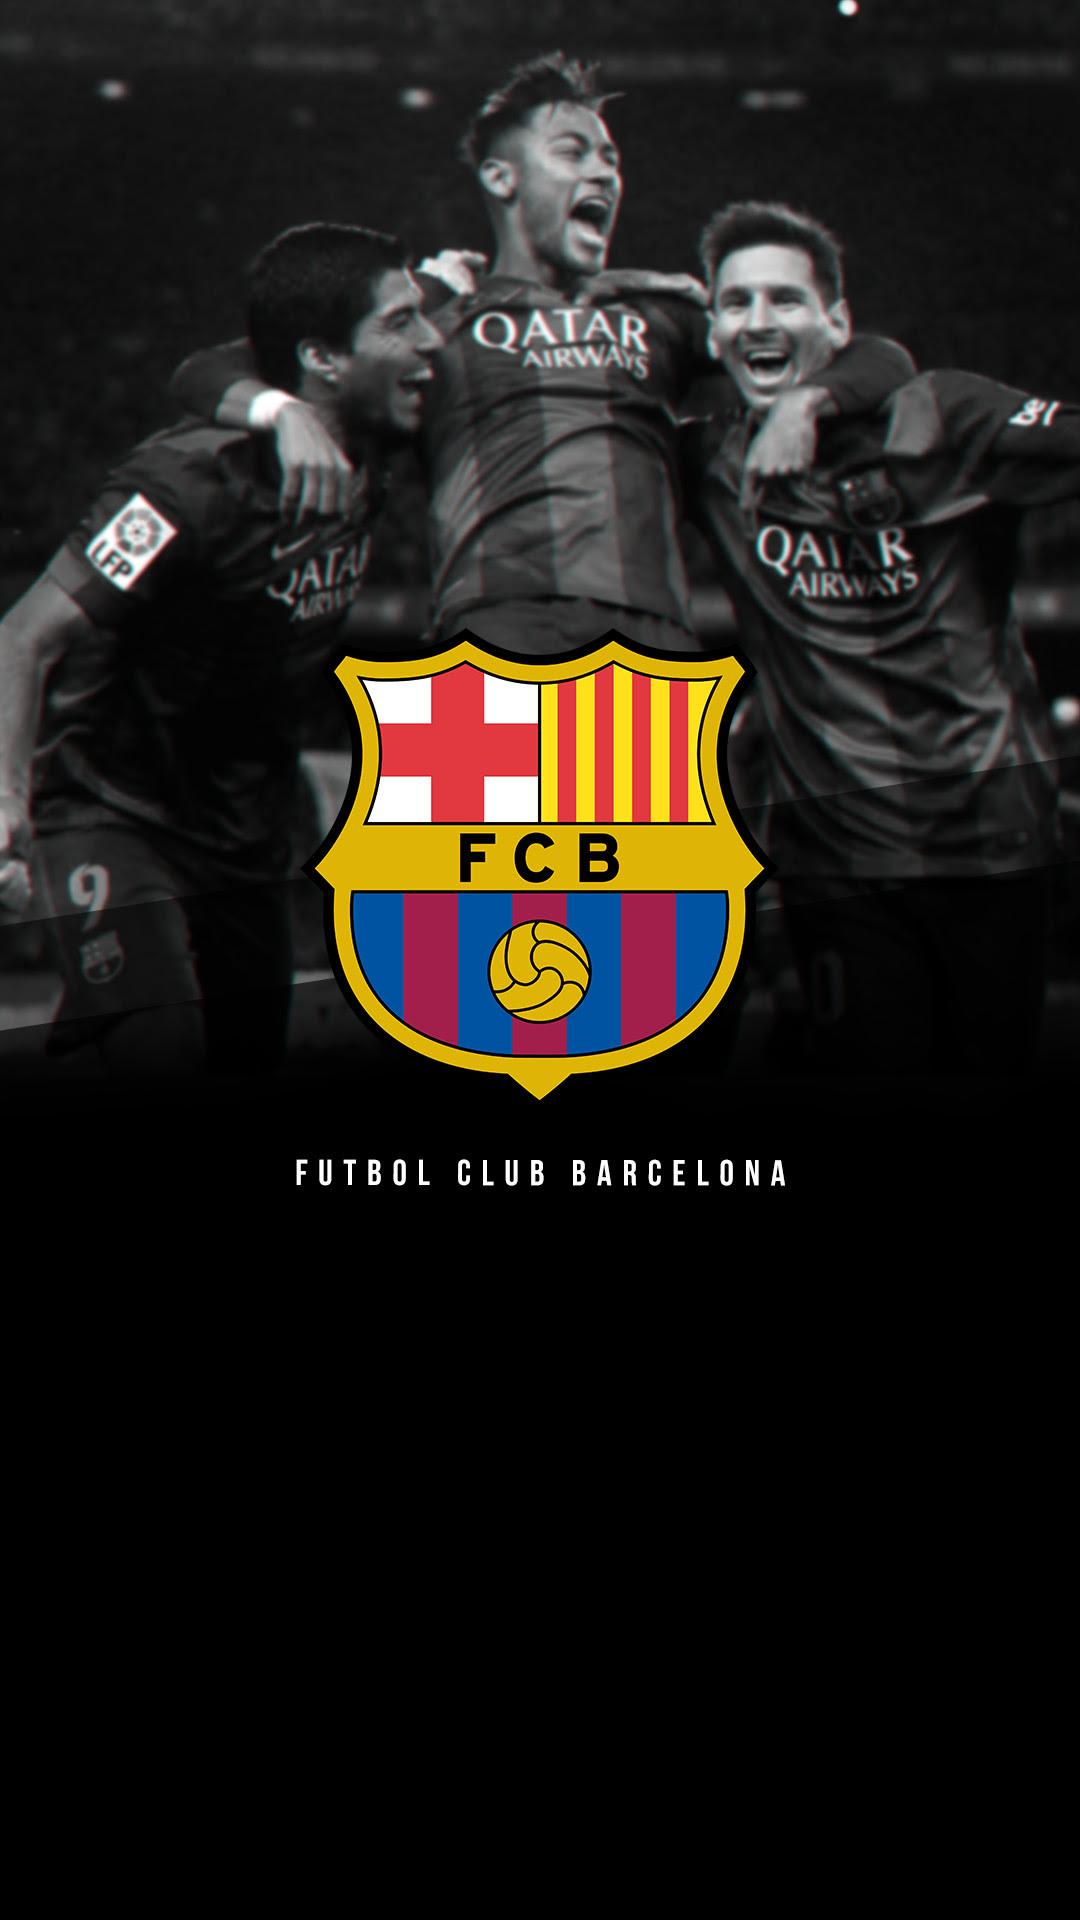 Fc Barcelona Wallpaper Iphone Xr